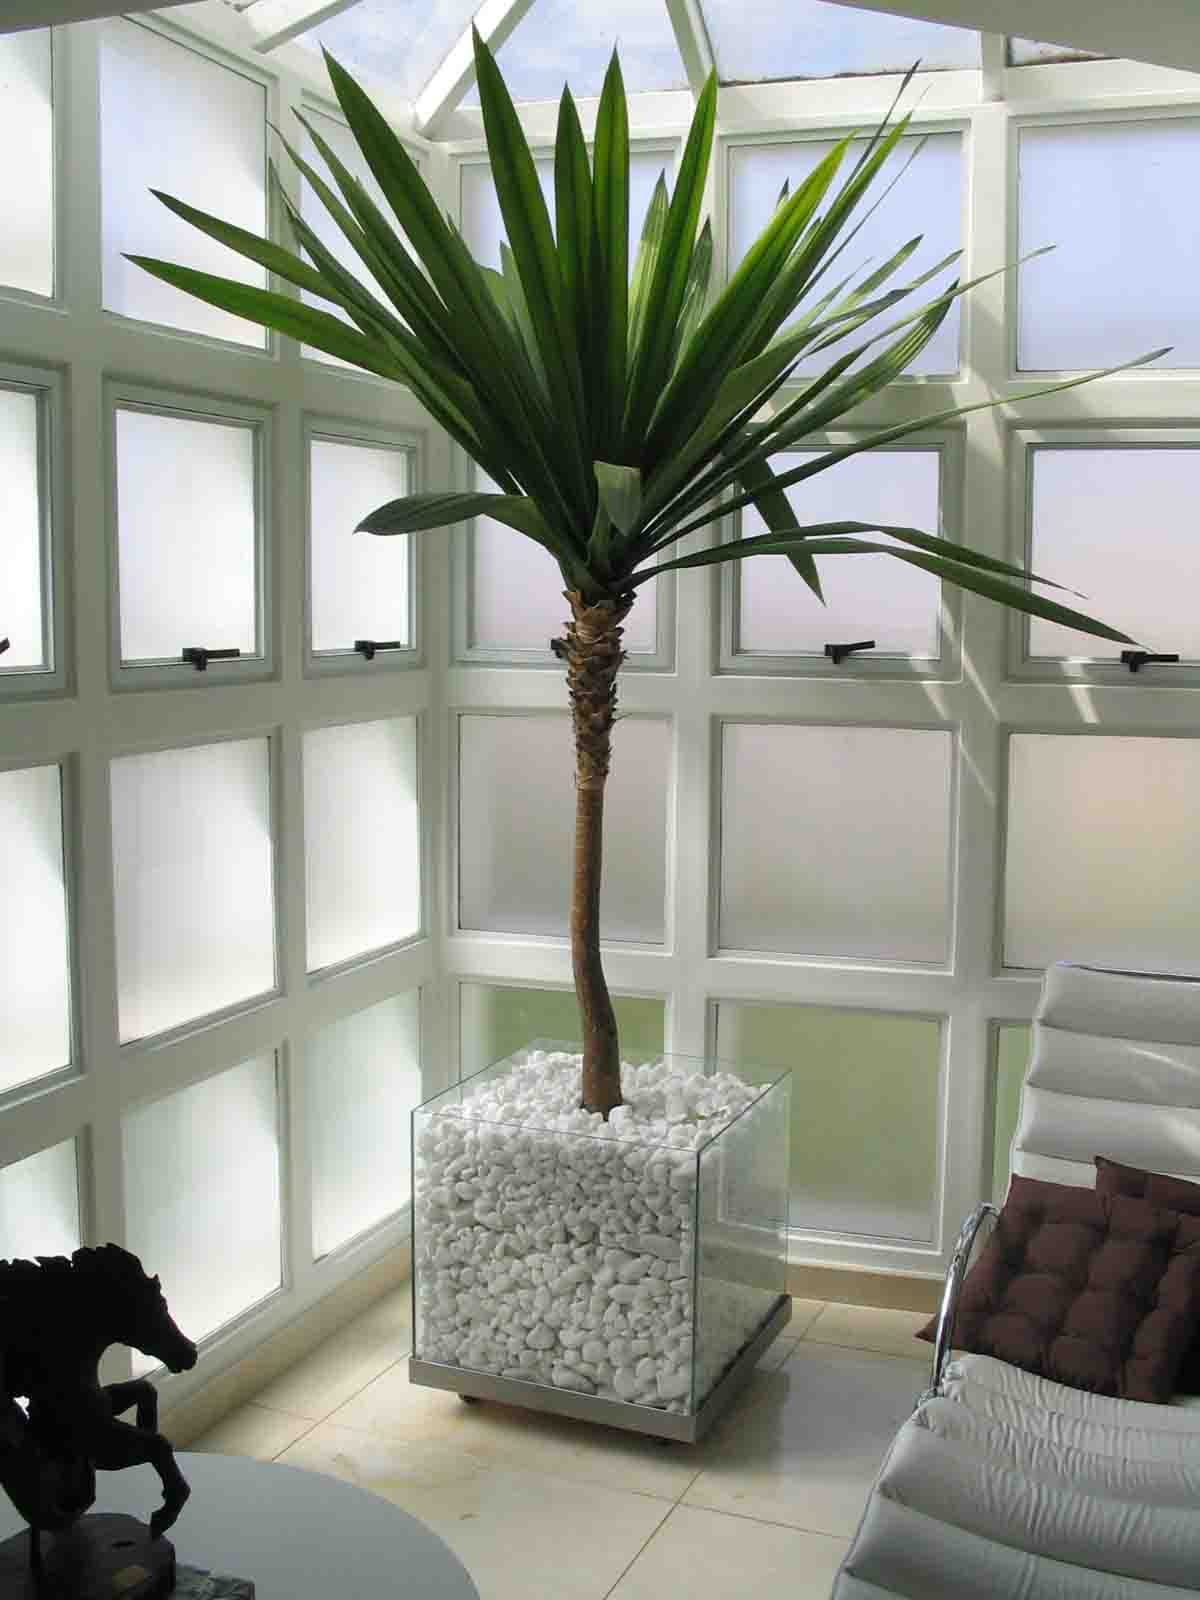 Vanderlei paisagista plantas e vasos para interiores for Plantas decorativas para interiores